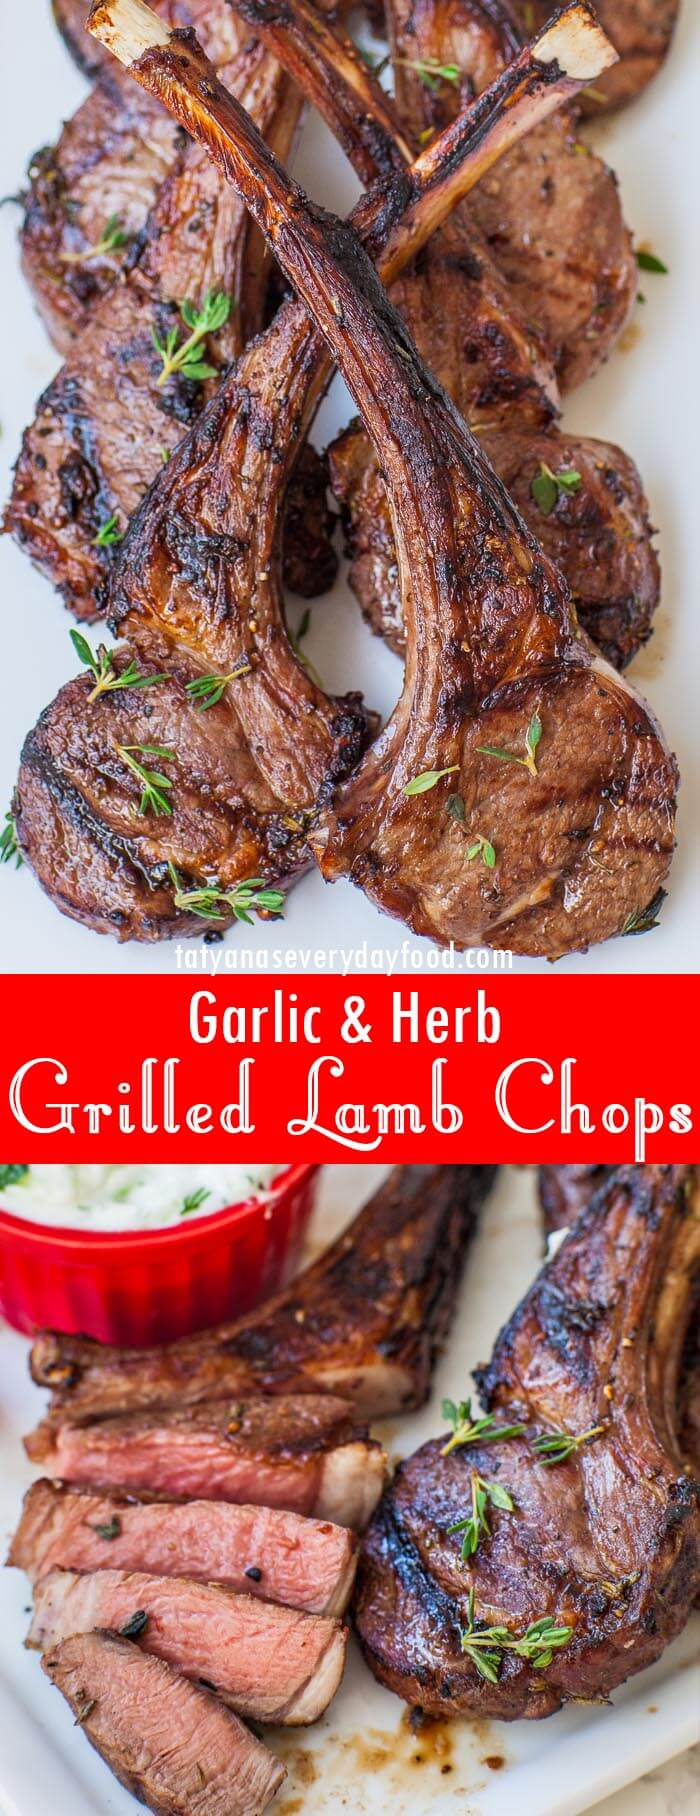 Garlic & Herb Grilled Lamb Chops video recipe